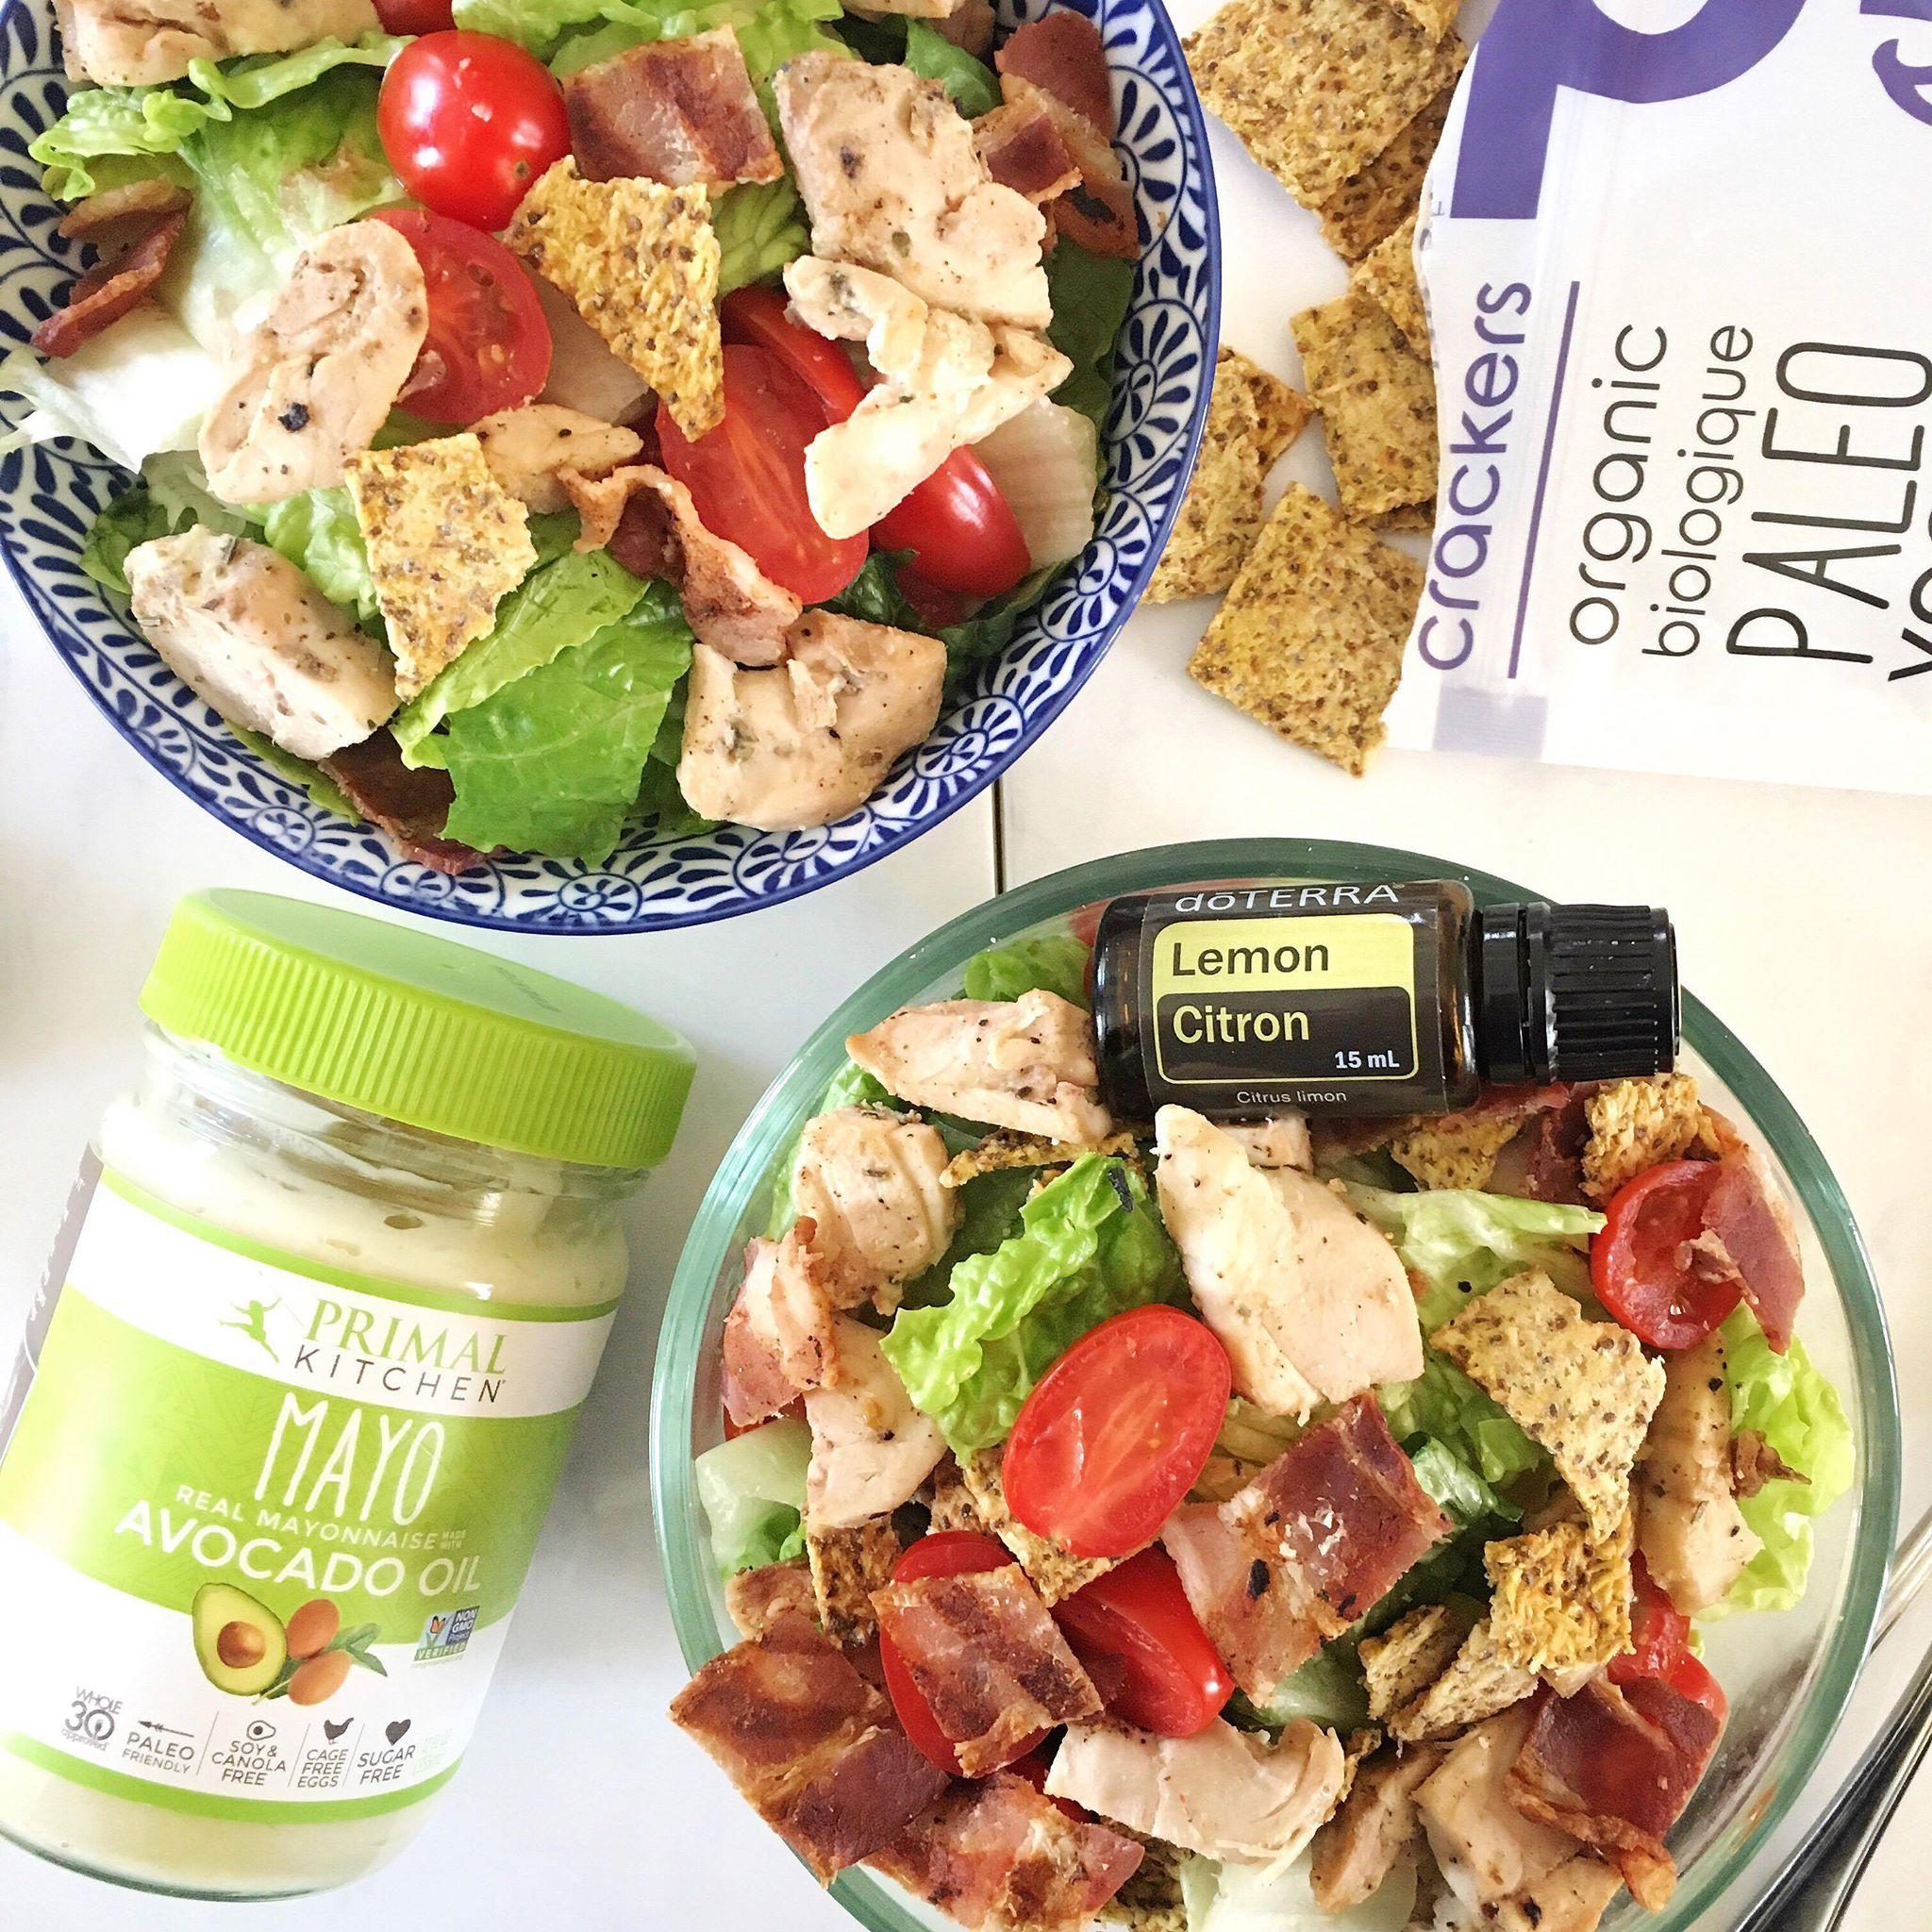 Glamified Gluten Free Caesar Salad